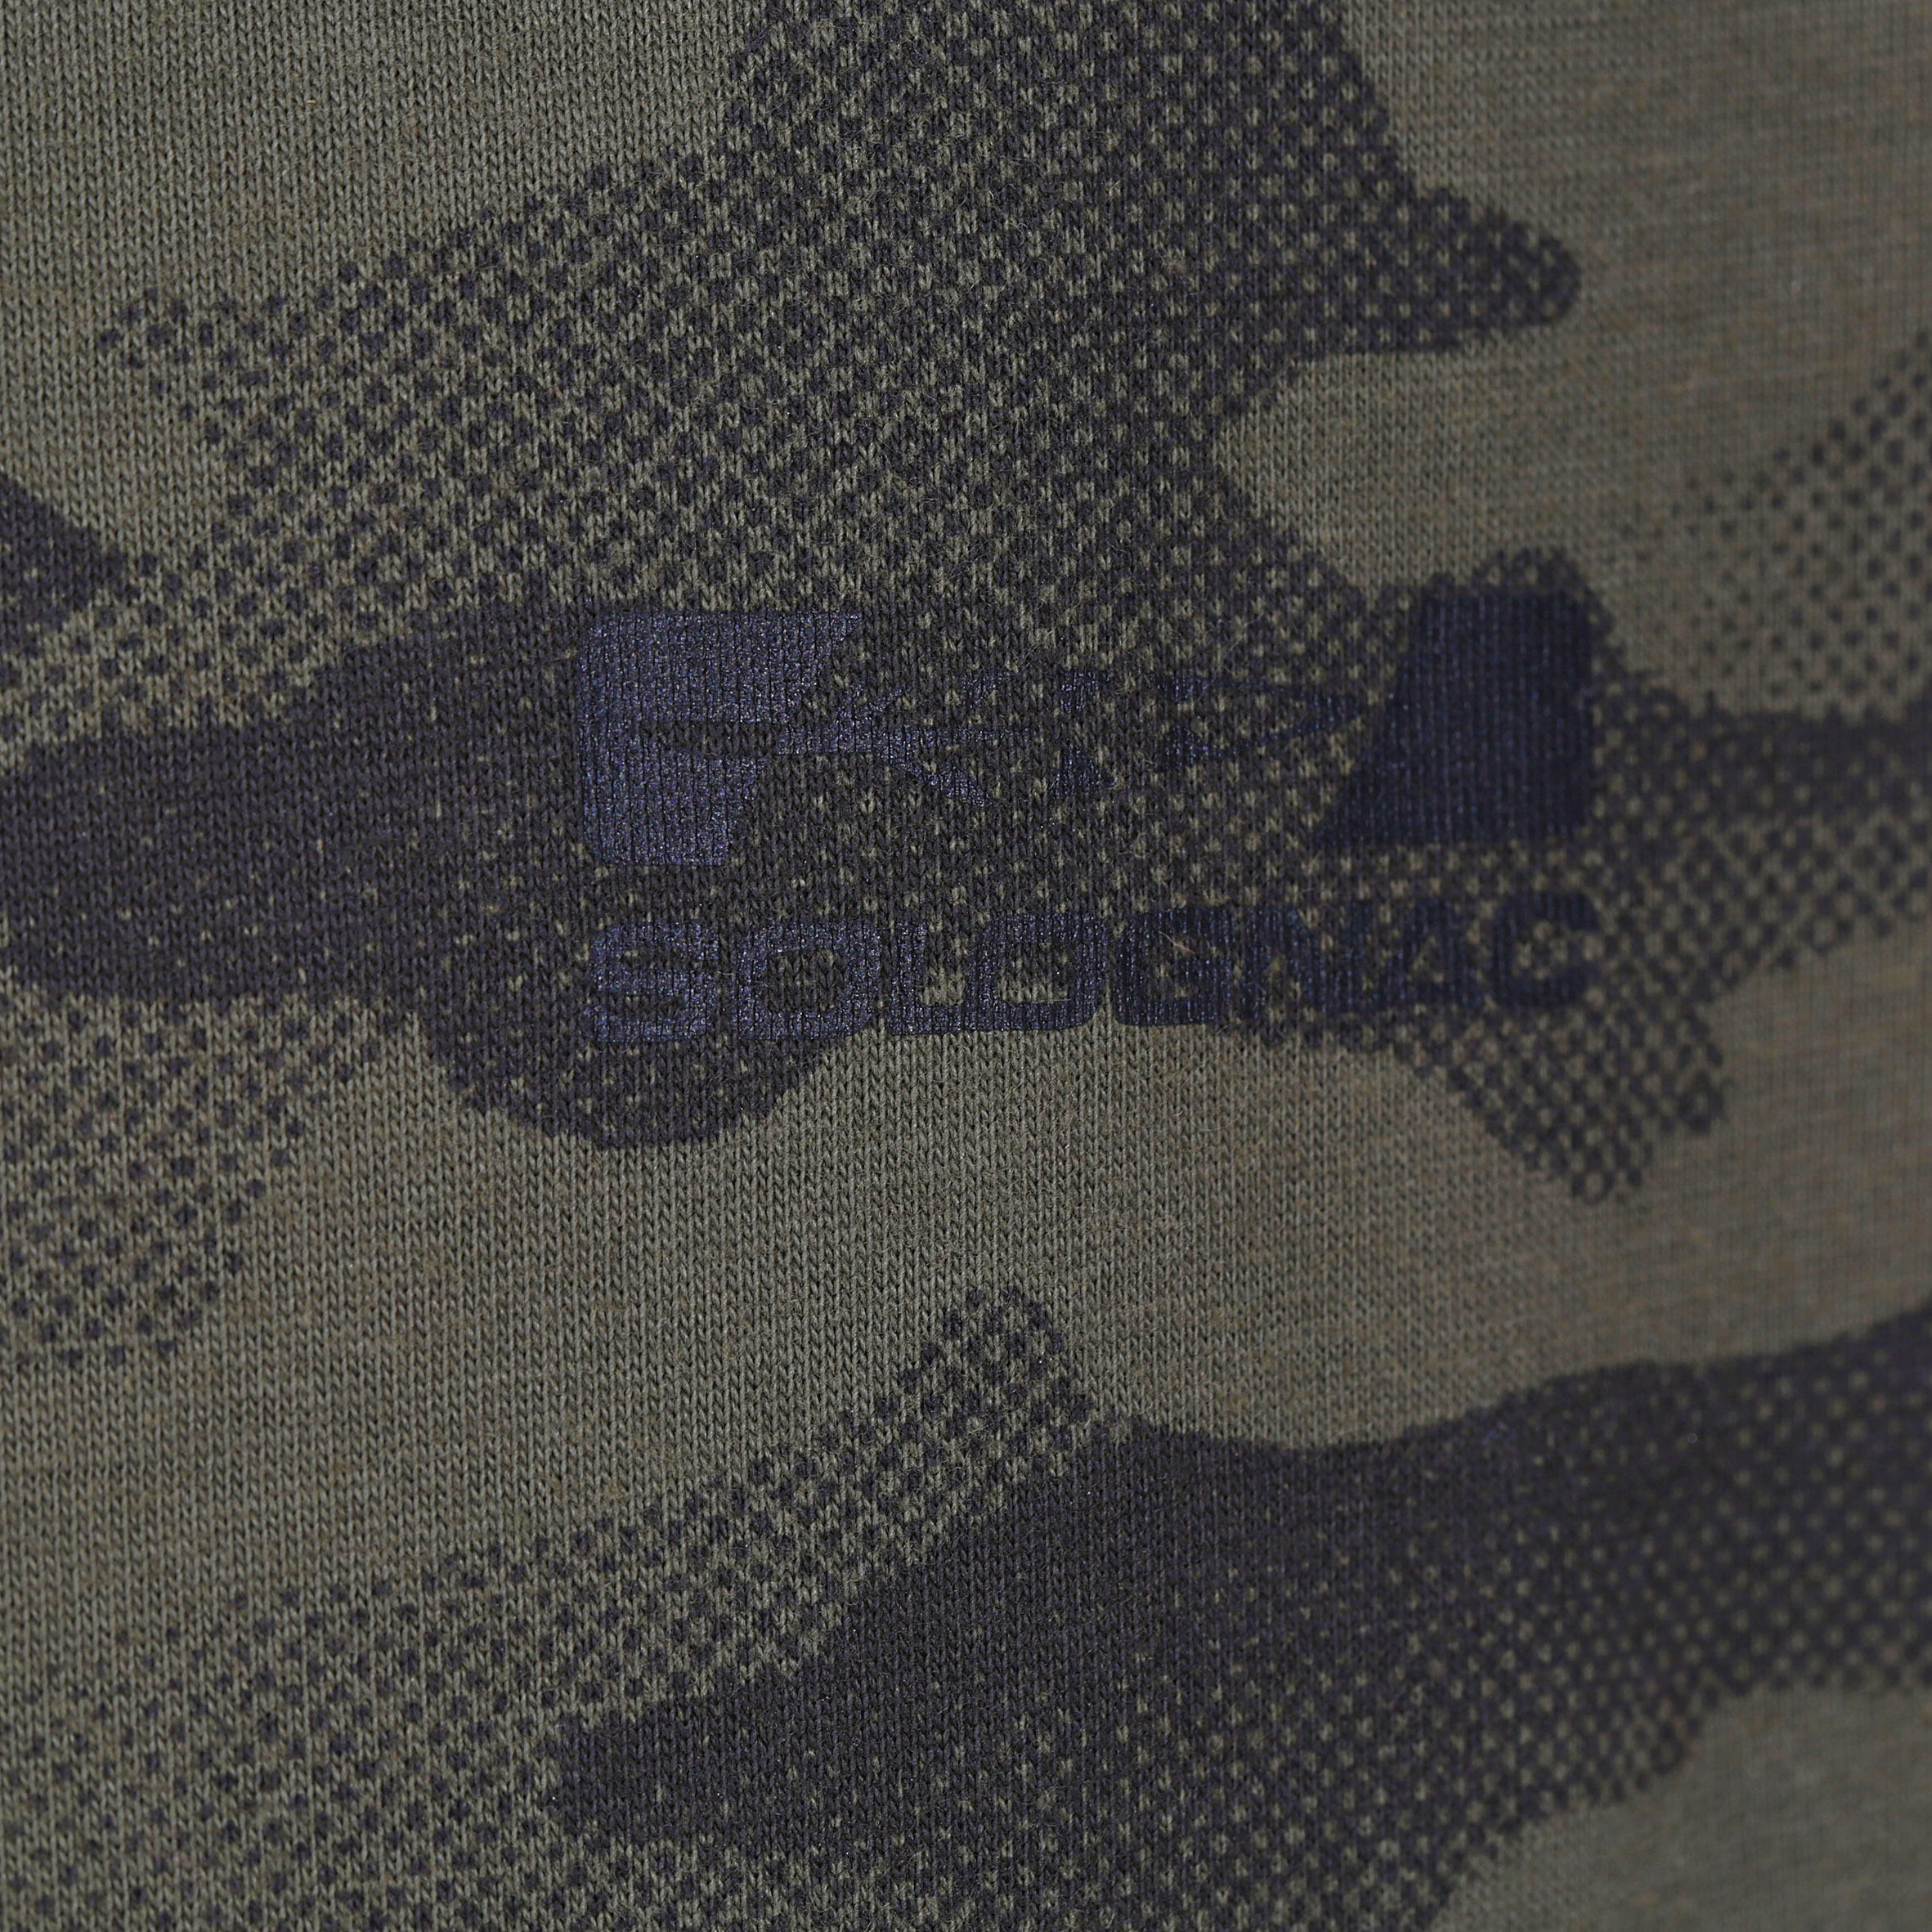 Tee-shirt de chasse Steppe 100 junior camouflage demi-teinte vert